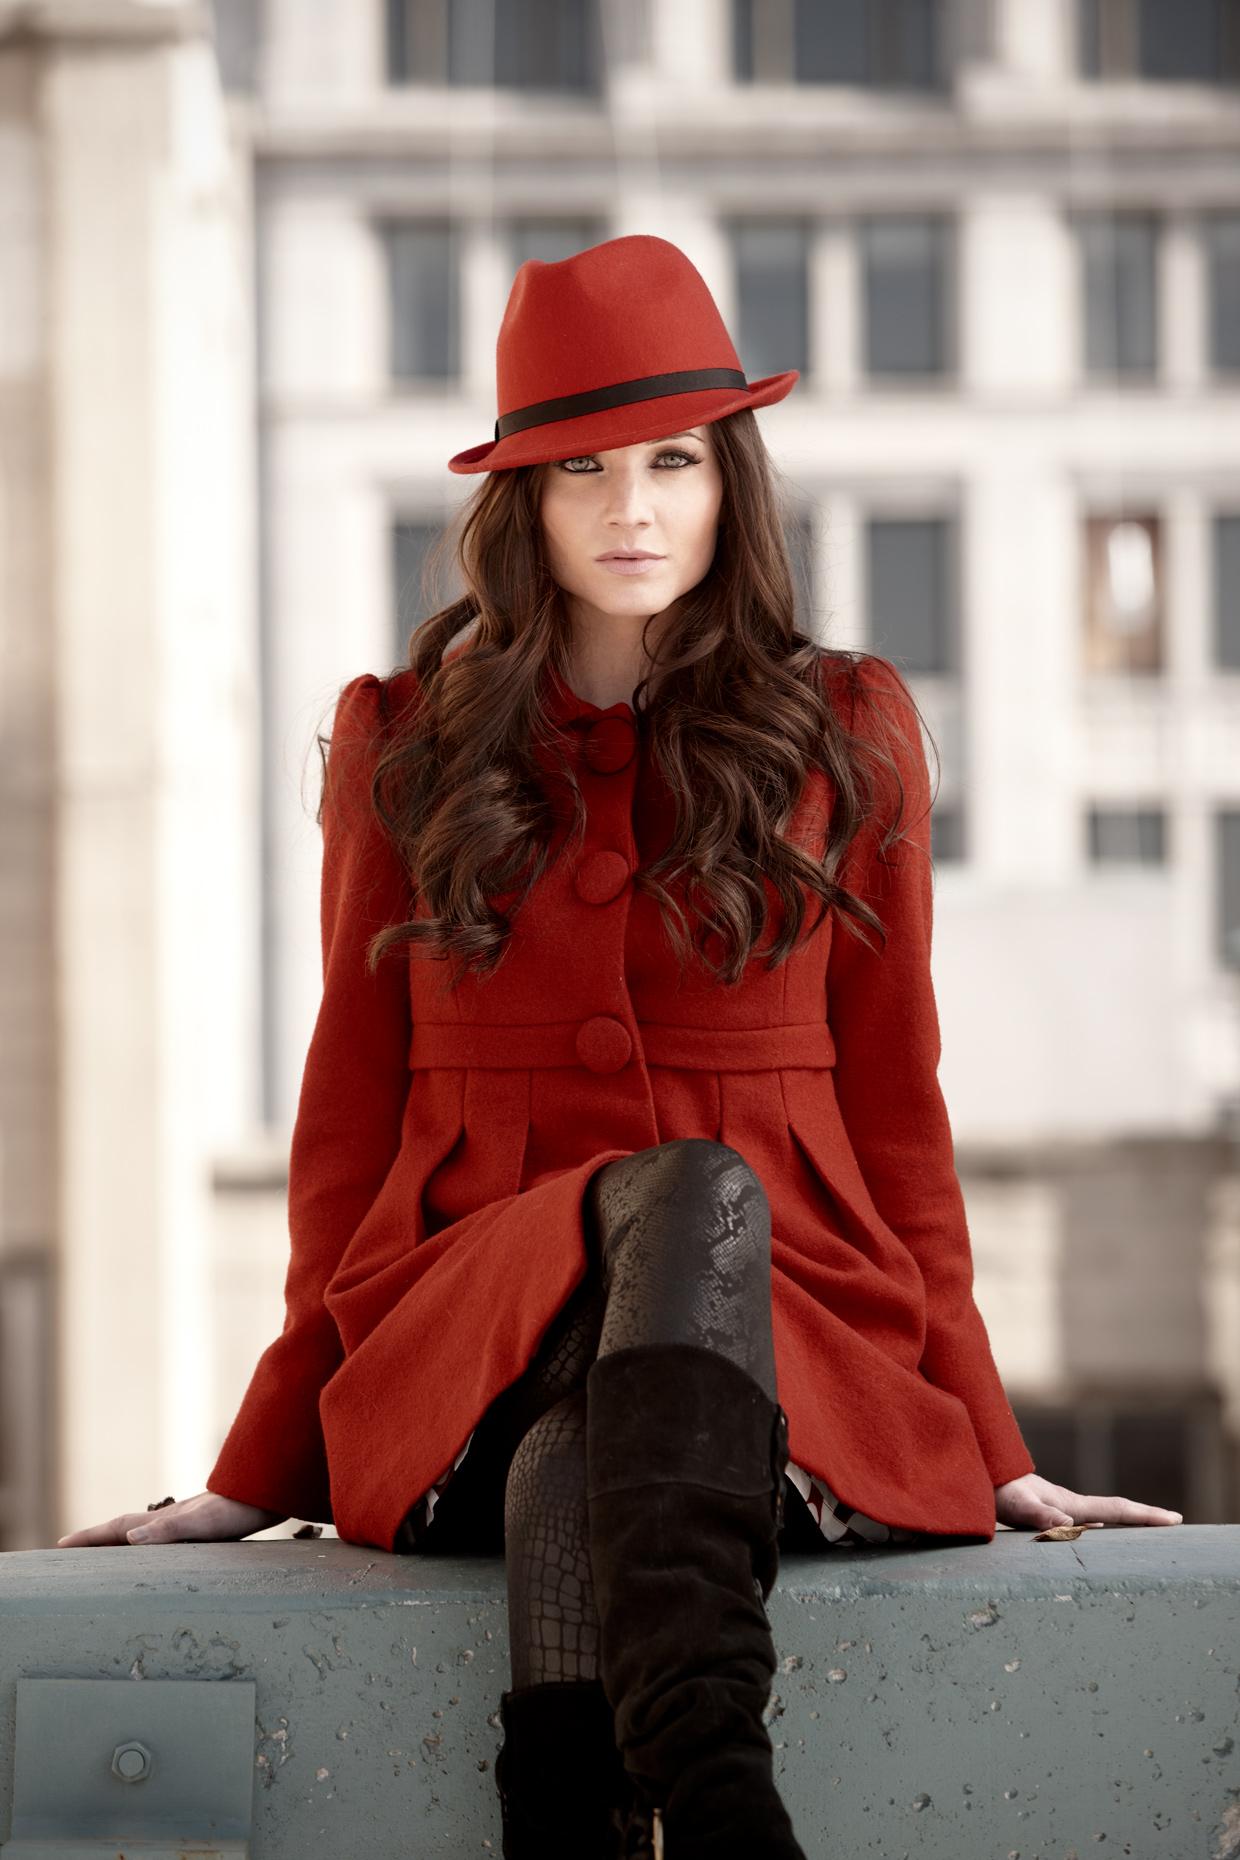 Lifestyle photography Derek Israelsen Red Hat Coat